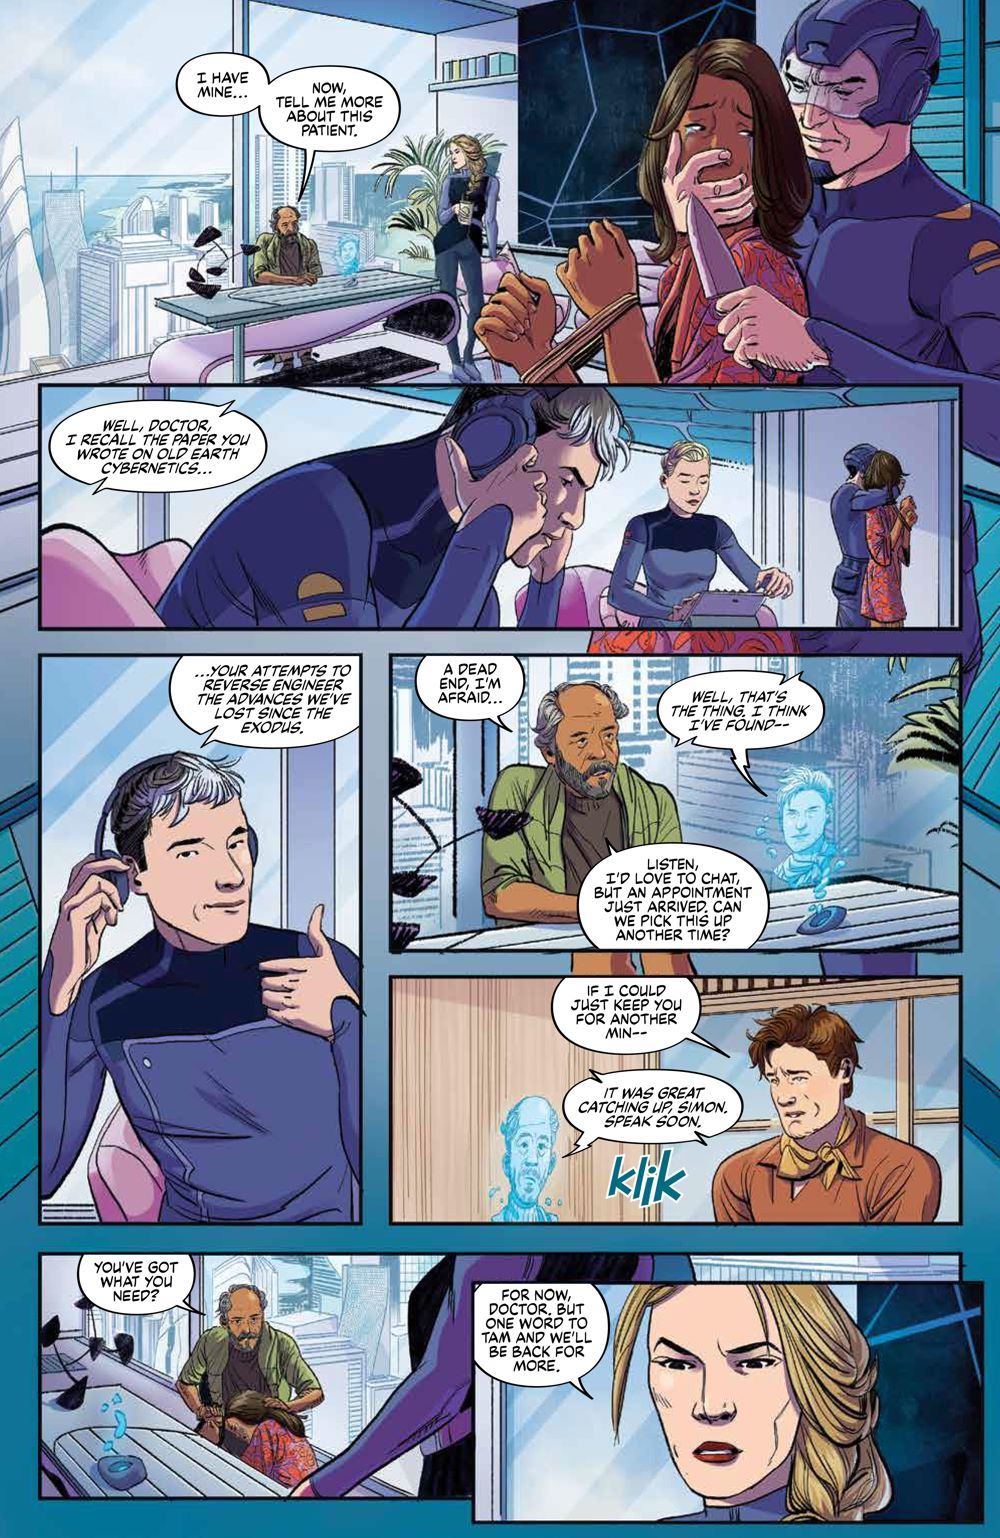 Firefly_BrandNewVerse_003_PRESS_8 ComicList Previews: FIREFLY A BRAND NEW 'VERSE #3 (OF 6)